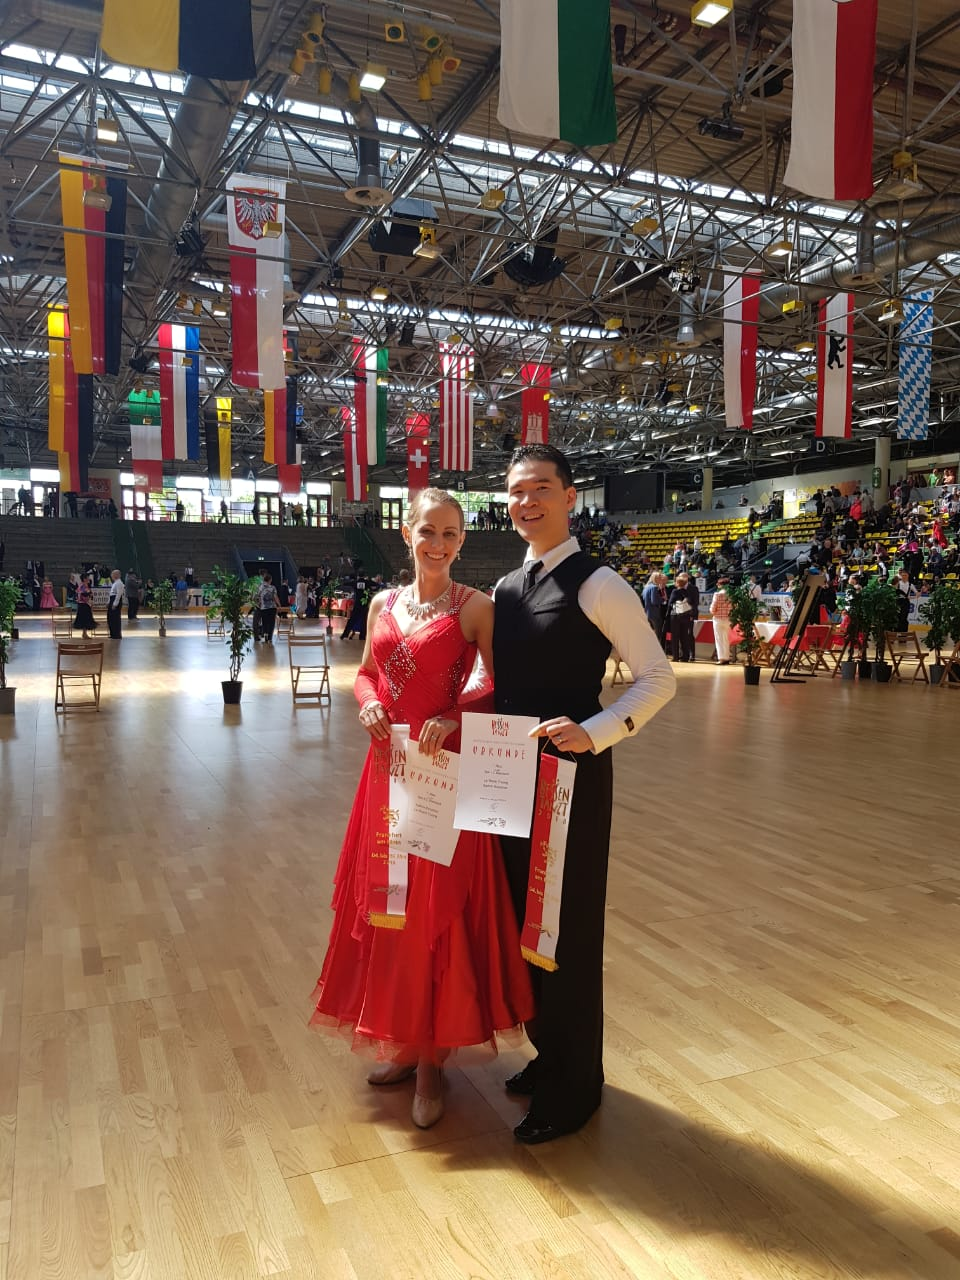 Karlsruhe Tanzt